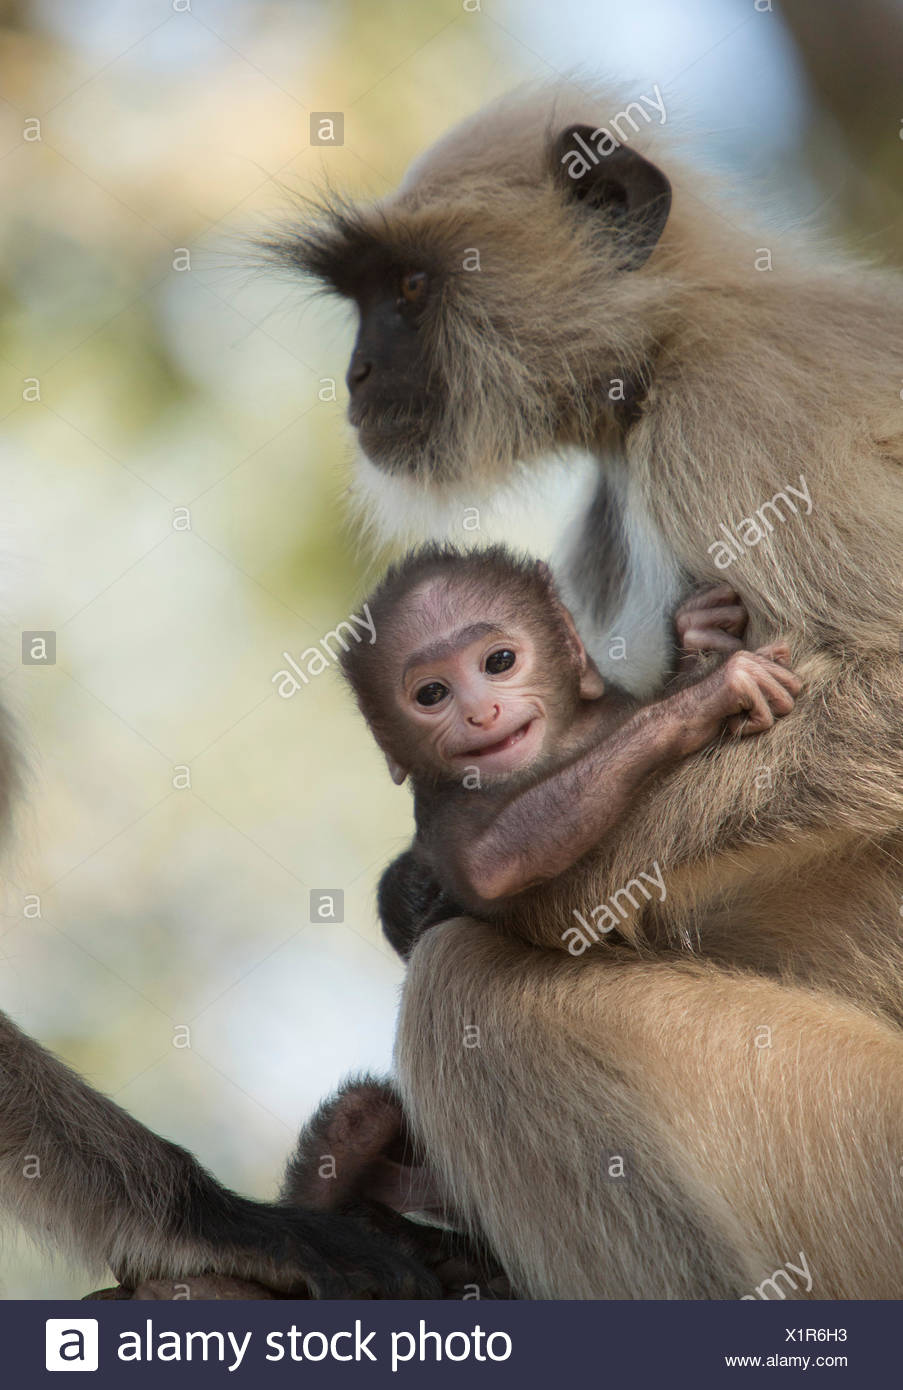 Hulman, Hanuman, Indian, monkey, Asia, animals, animal, female, young, - Stock Image